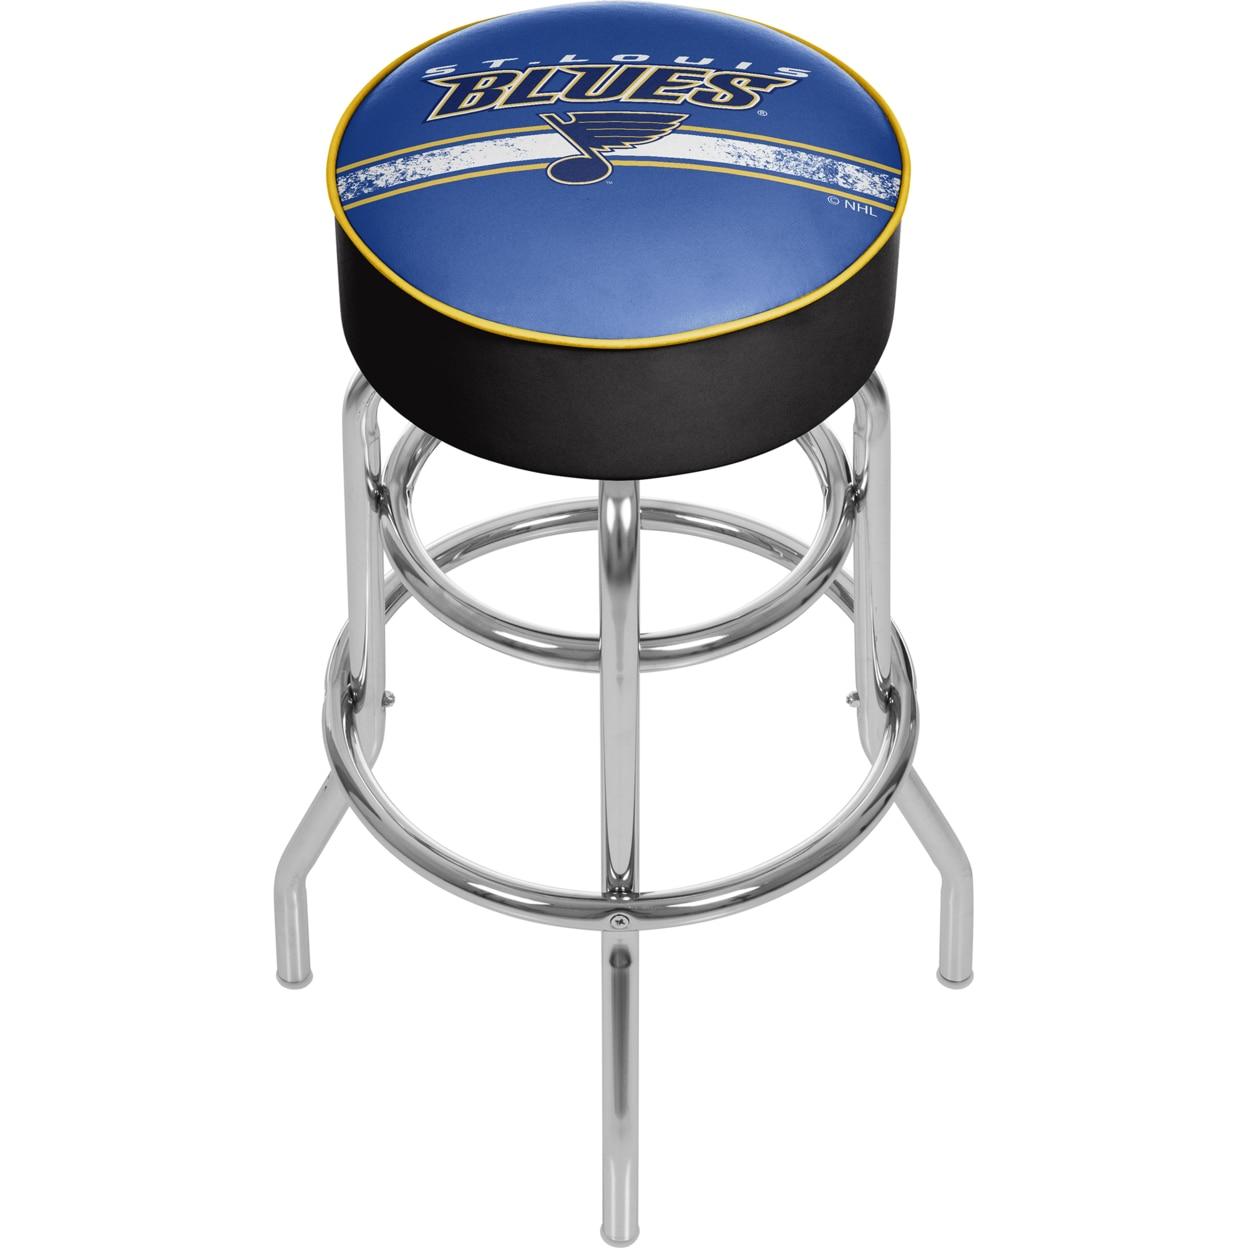 NHL Chrome 30 Inch Bar Stool with Swivel - St. Louis Blues купить nhl 10 на xbox